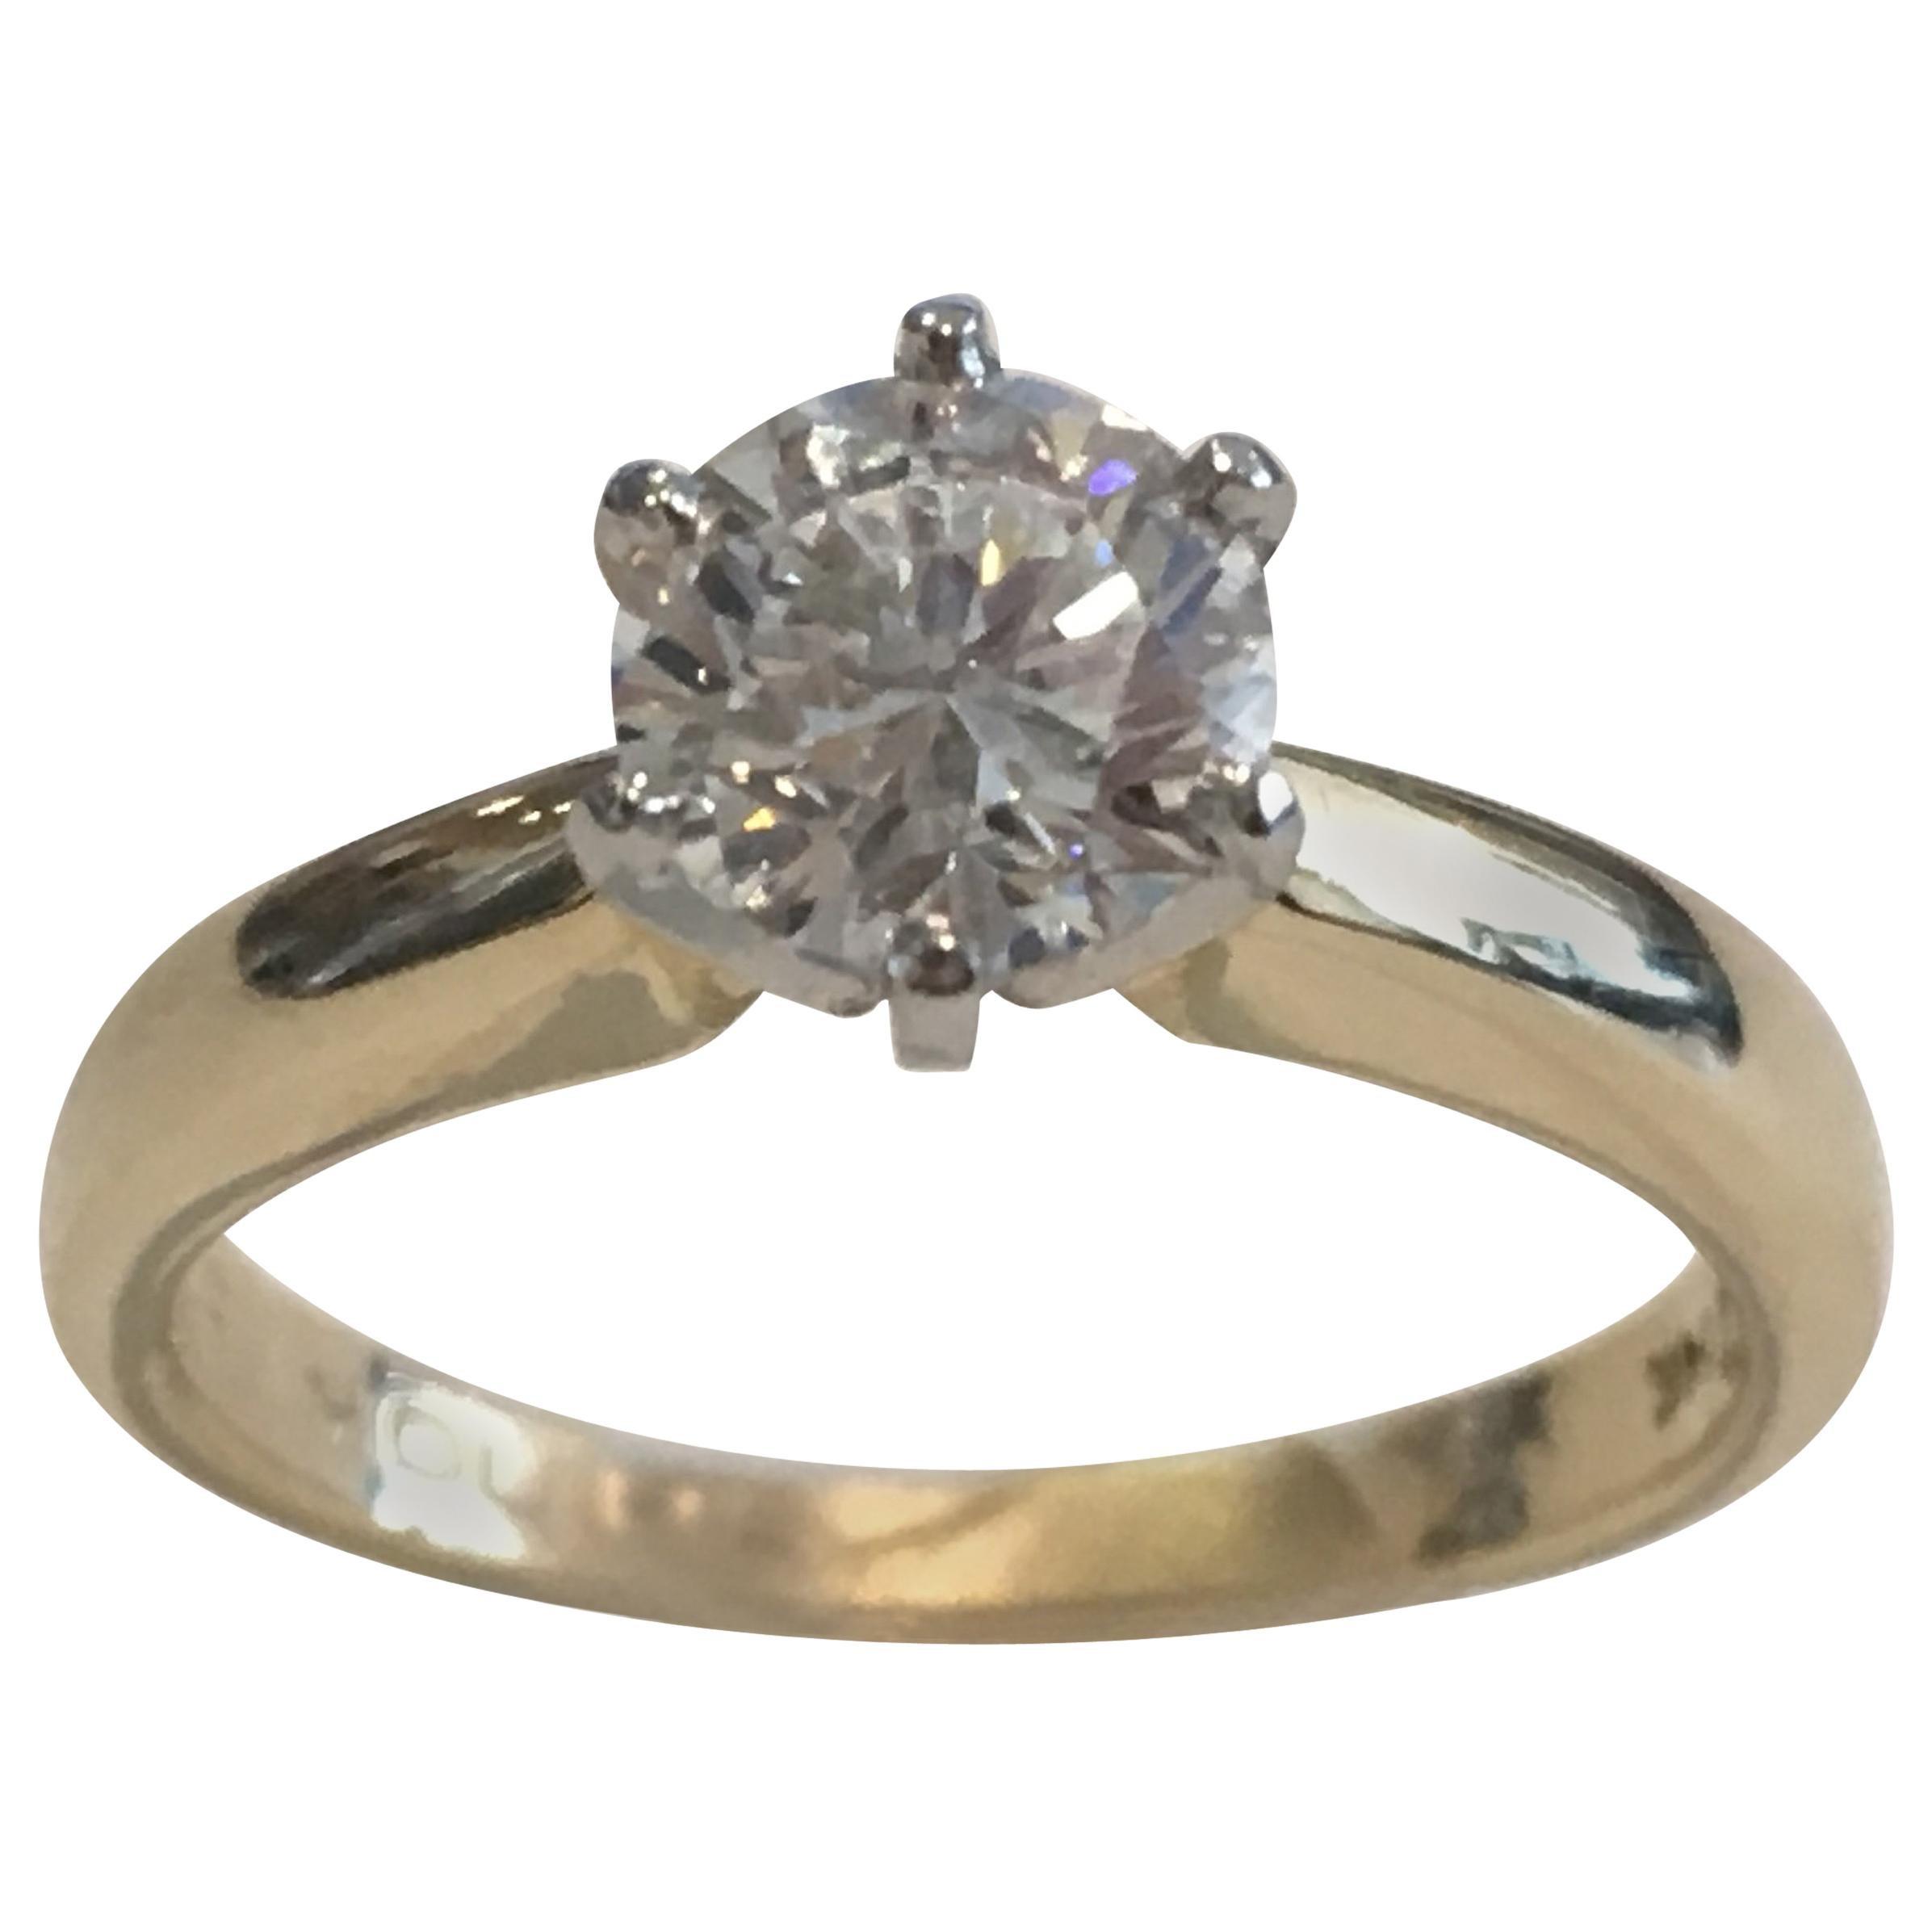 GIA Certified 14 Karat Yellow Gold Diamond Solitaire Engagement Ring